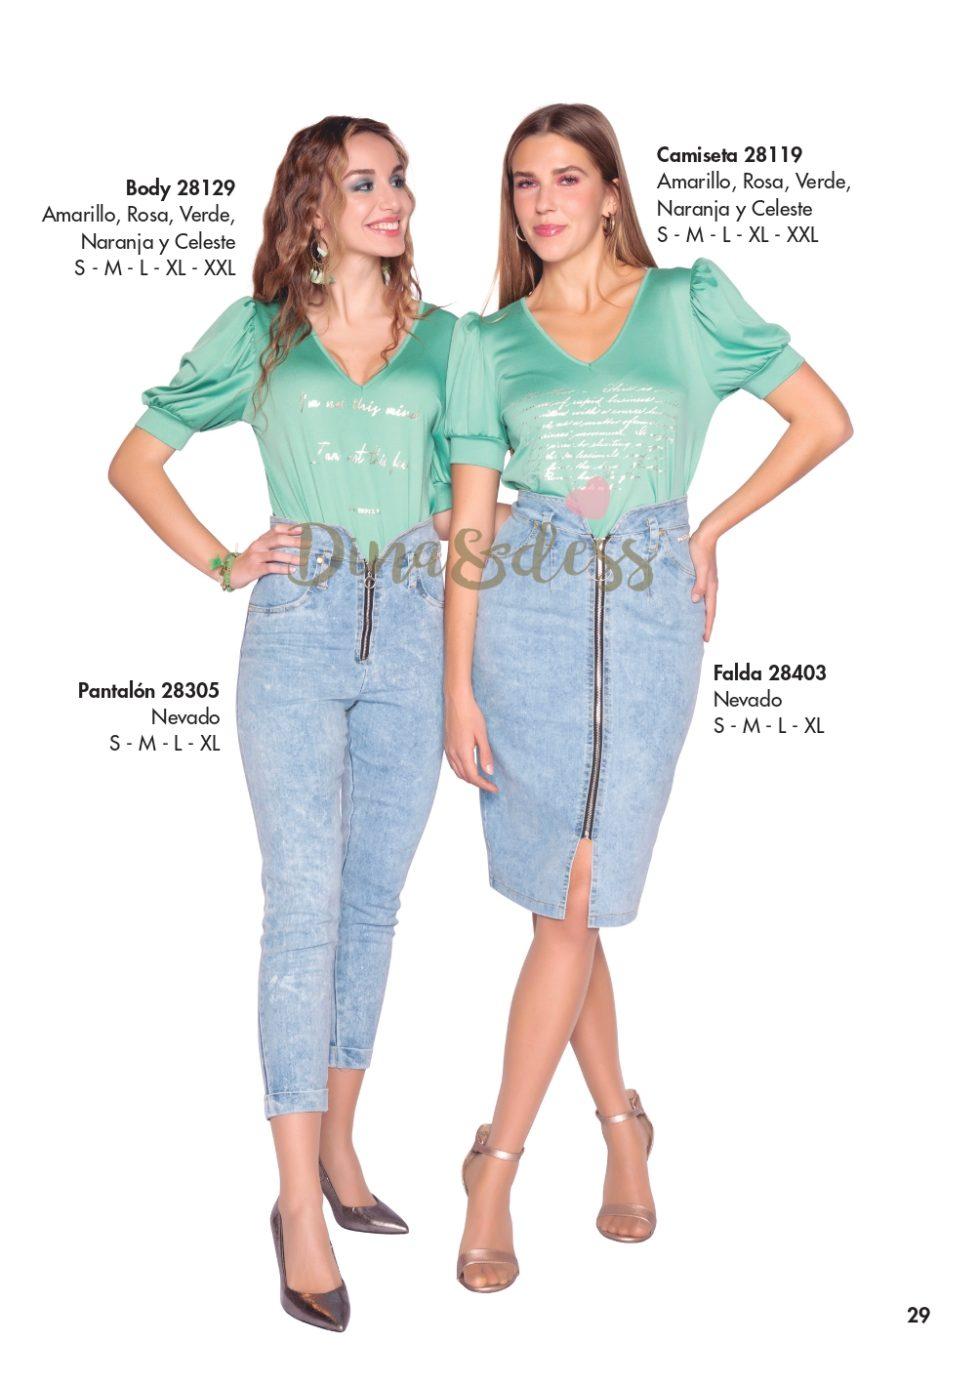 Verano 2021 Dina&Dess Clientes_page-0031